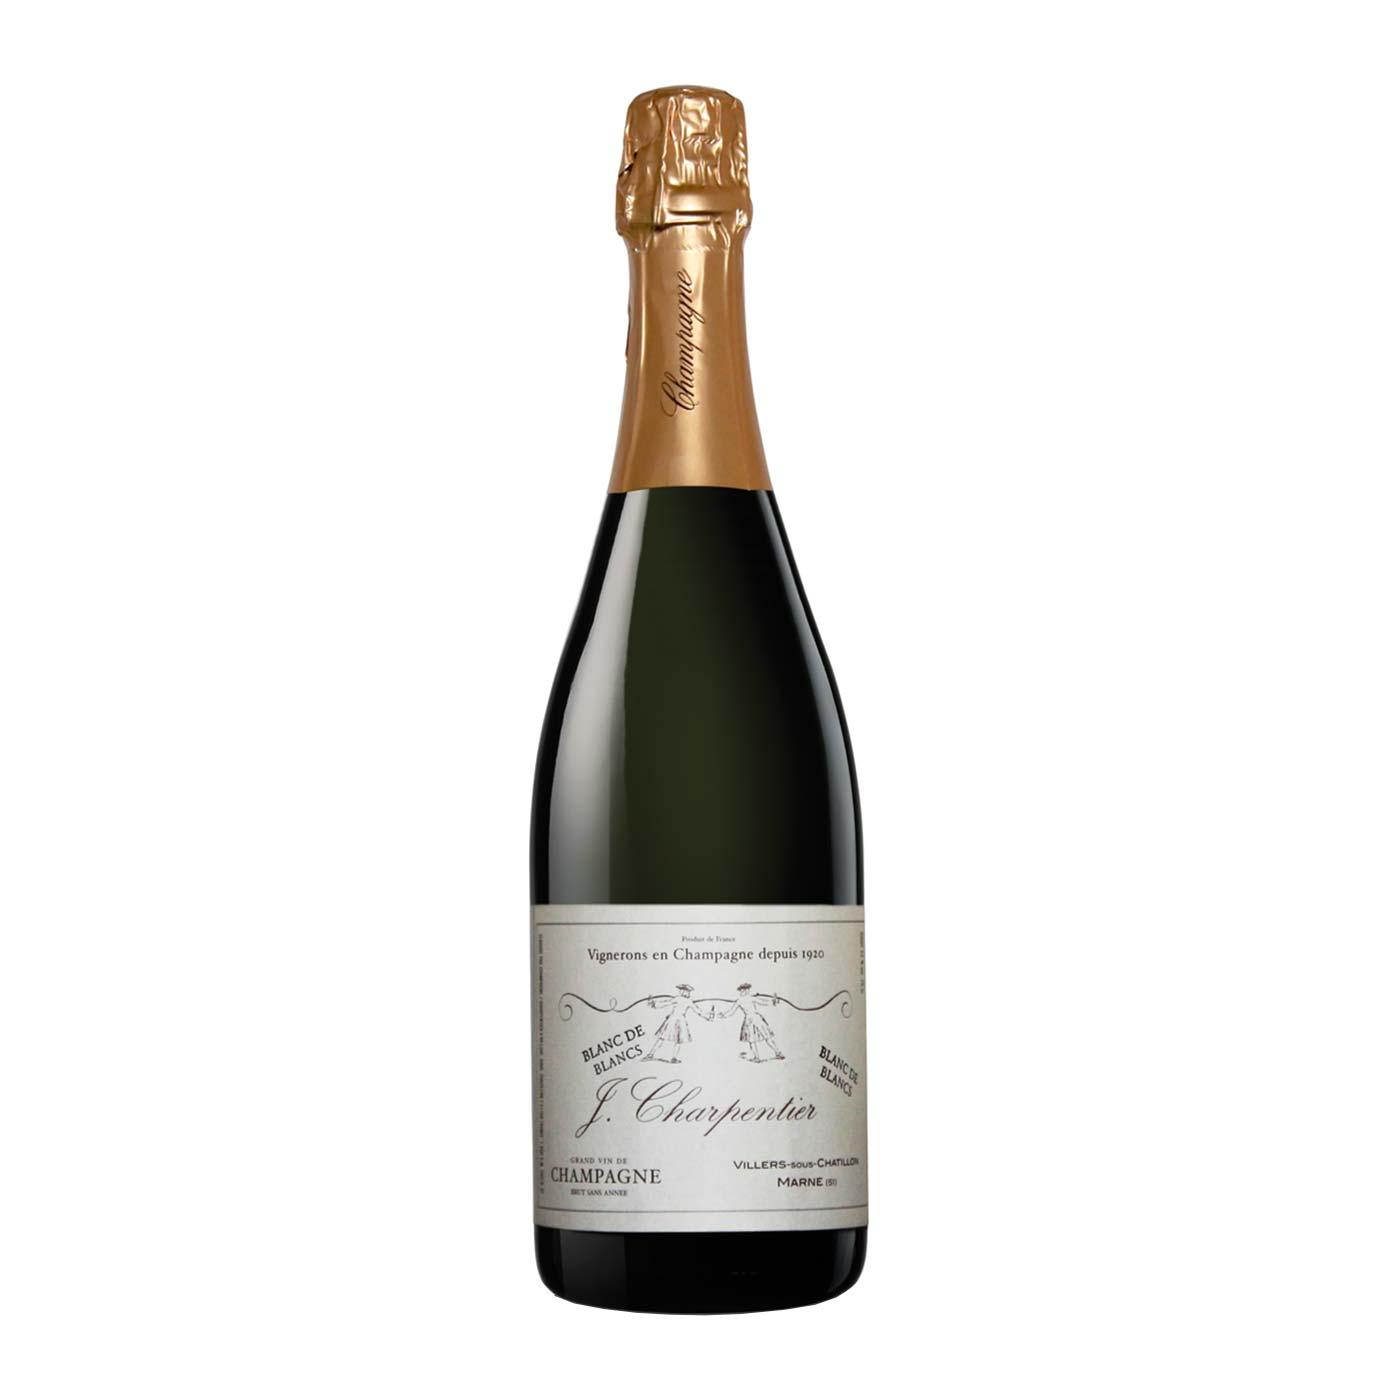 NV CHAMPAGNE JOIE BLANC DE BLANCS, Champagne